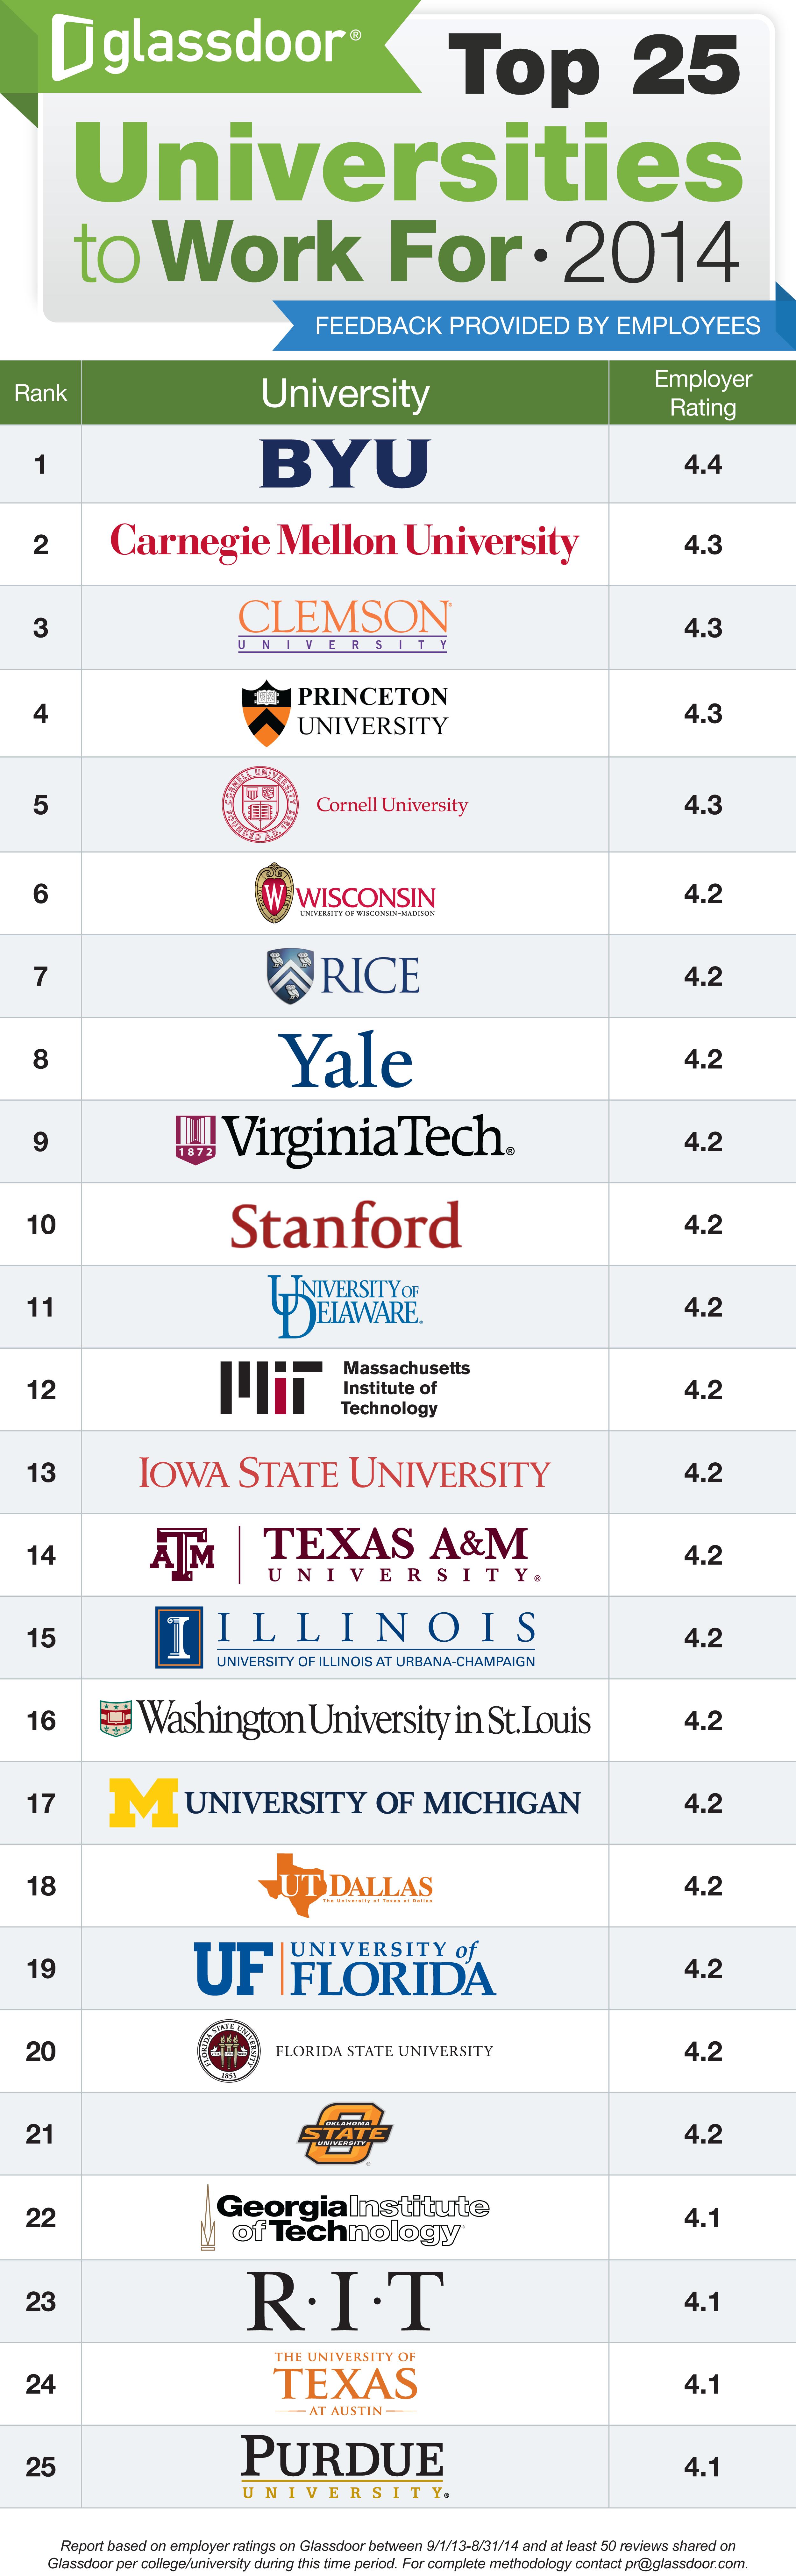 Glassdoor's 4th annual top 25 universities to work for